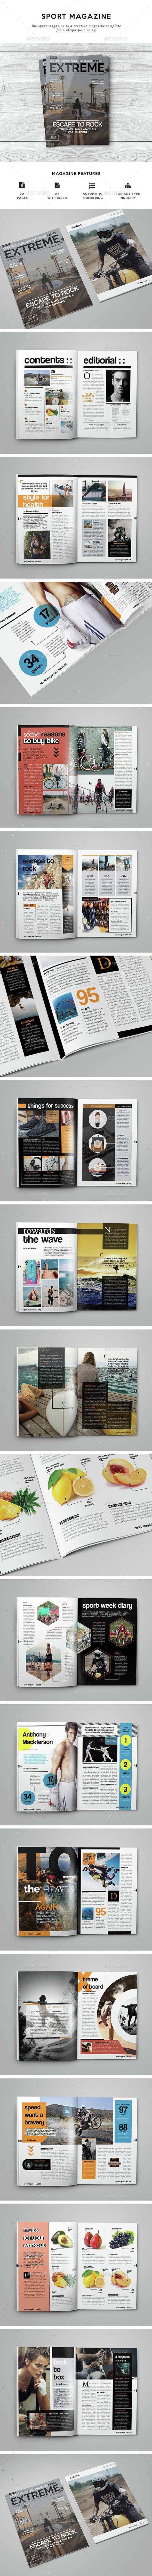 Sport Magazine #indesign #Template | Magazine Template & Design ...